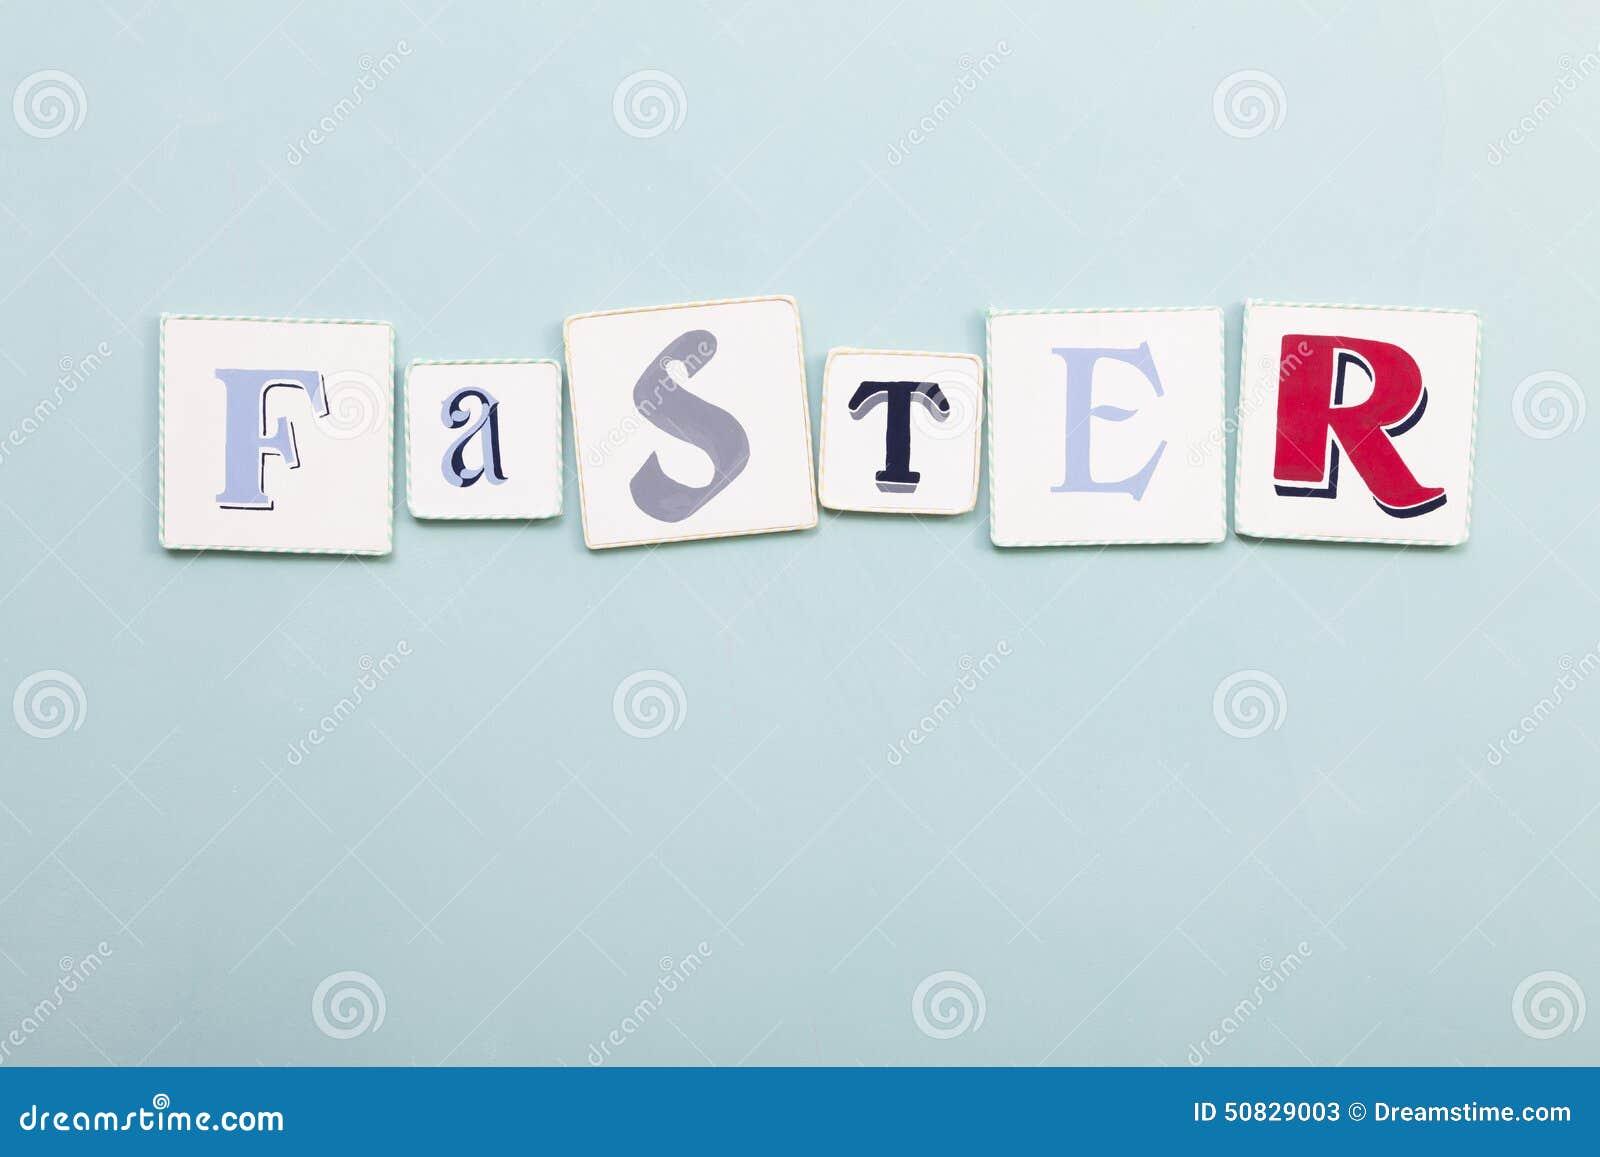 Faster signboard. Handwritten colors letters word. Light blue backgro